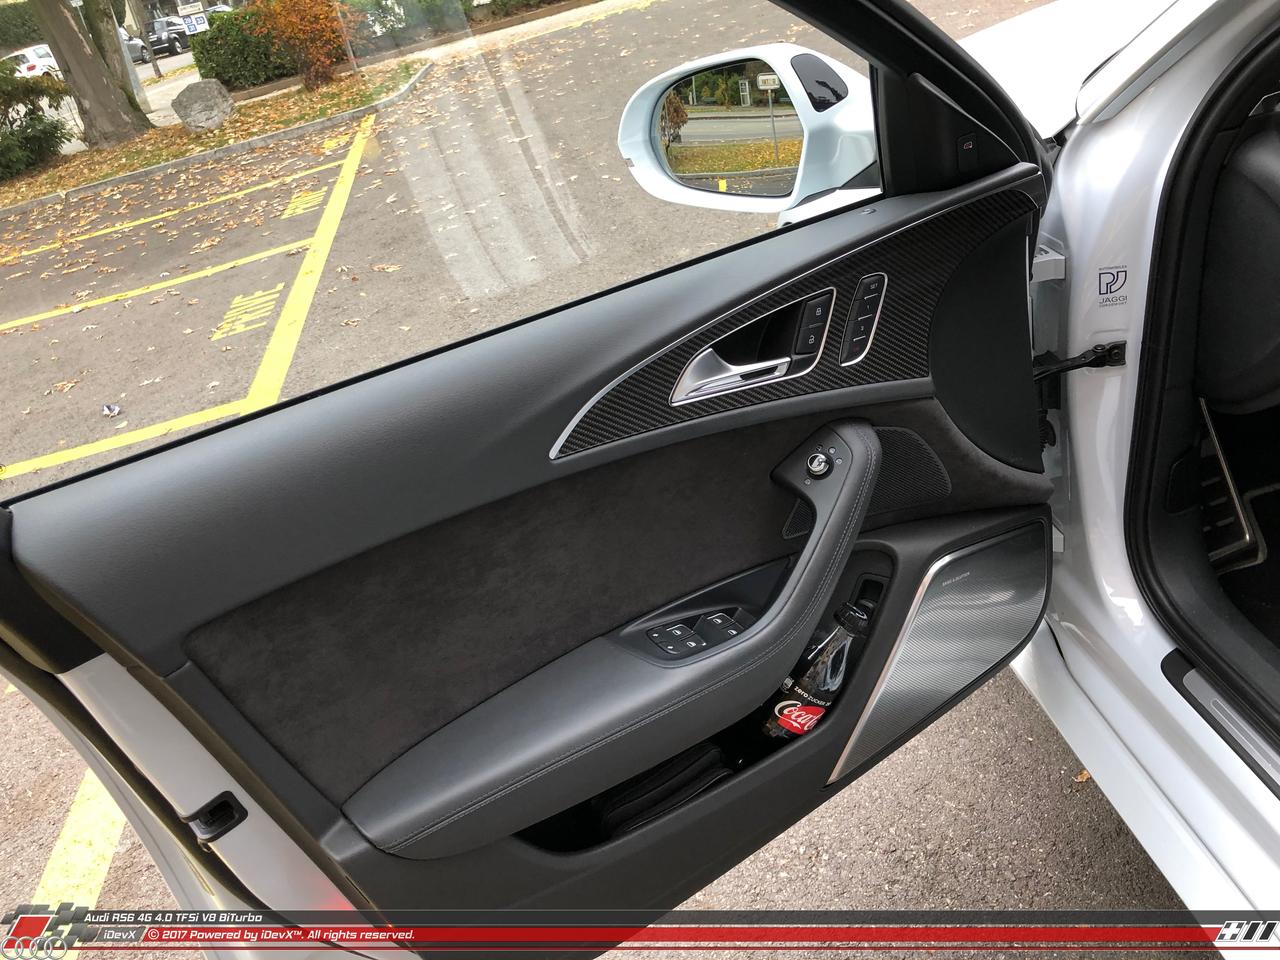 10_11.2018_Audi-RS6_iDevX_001.png